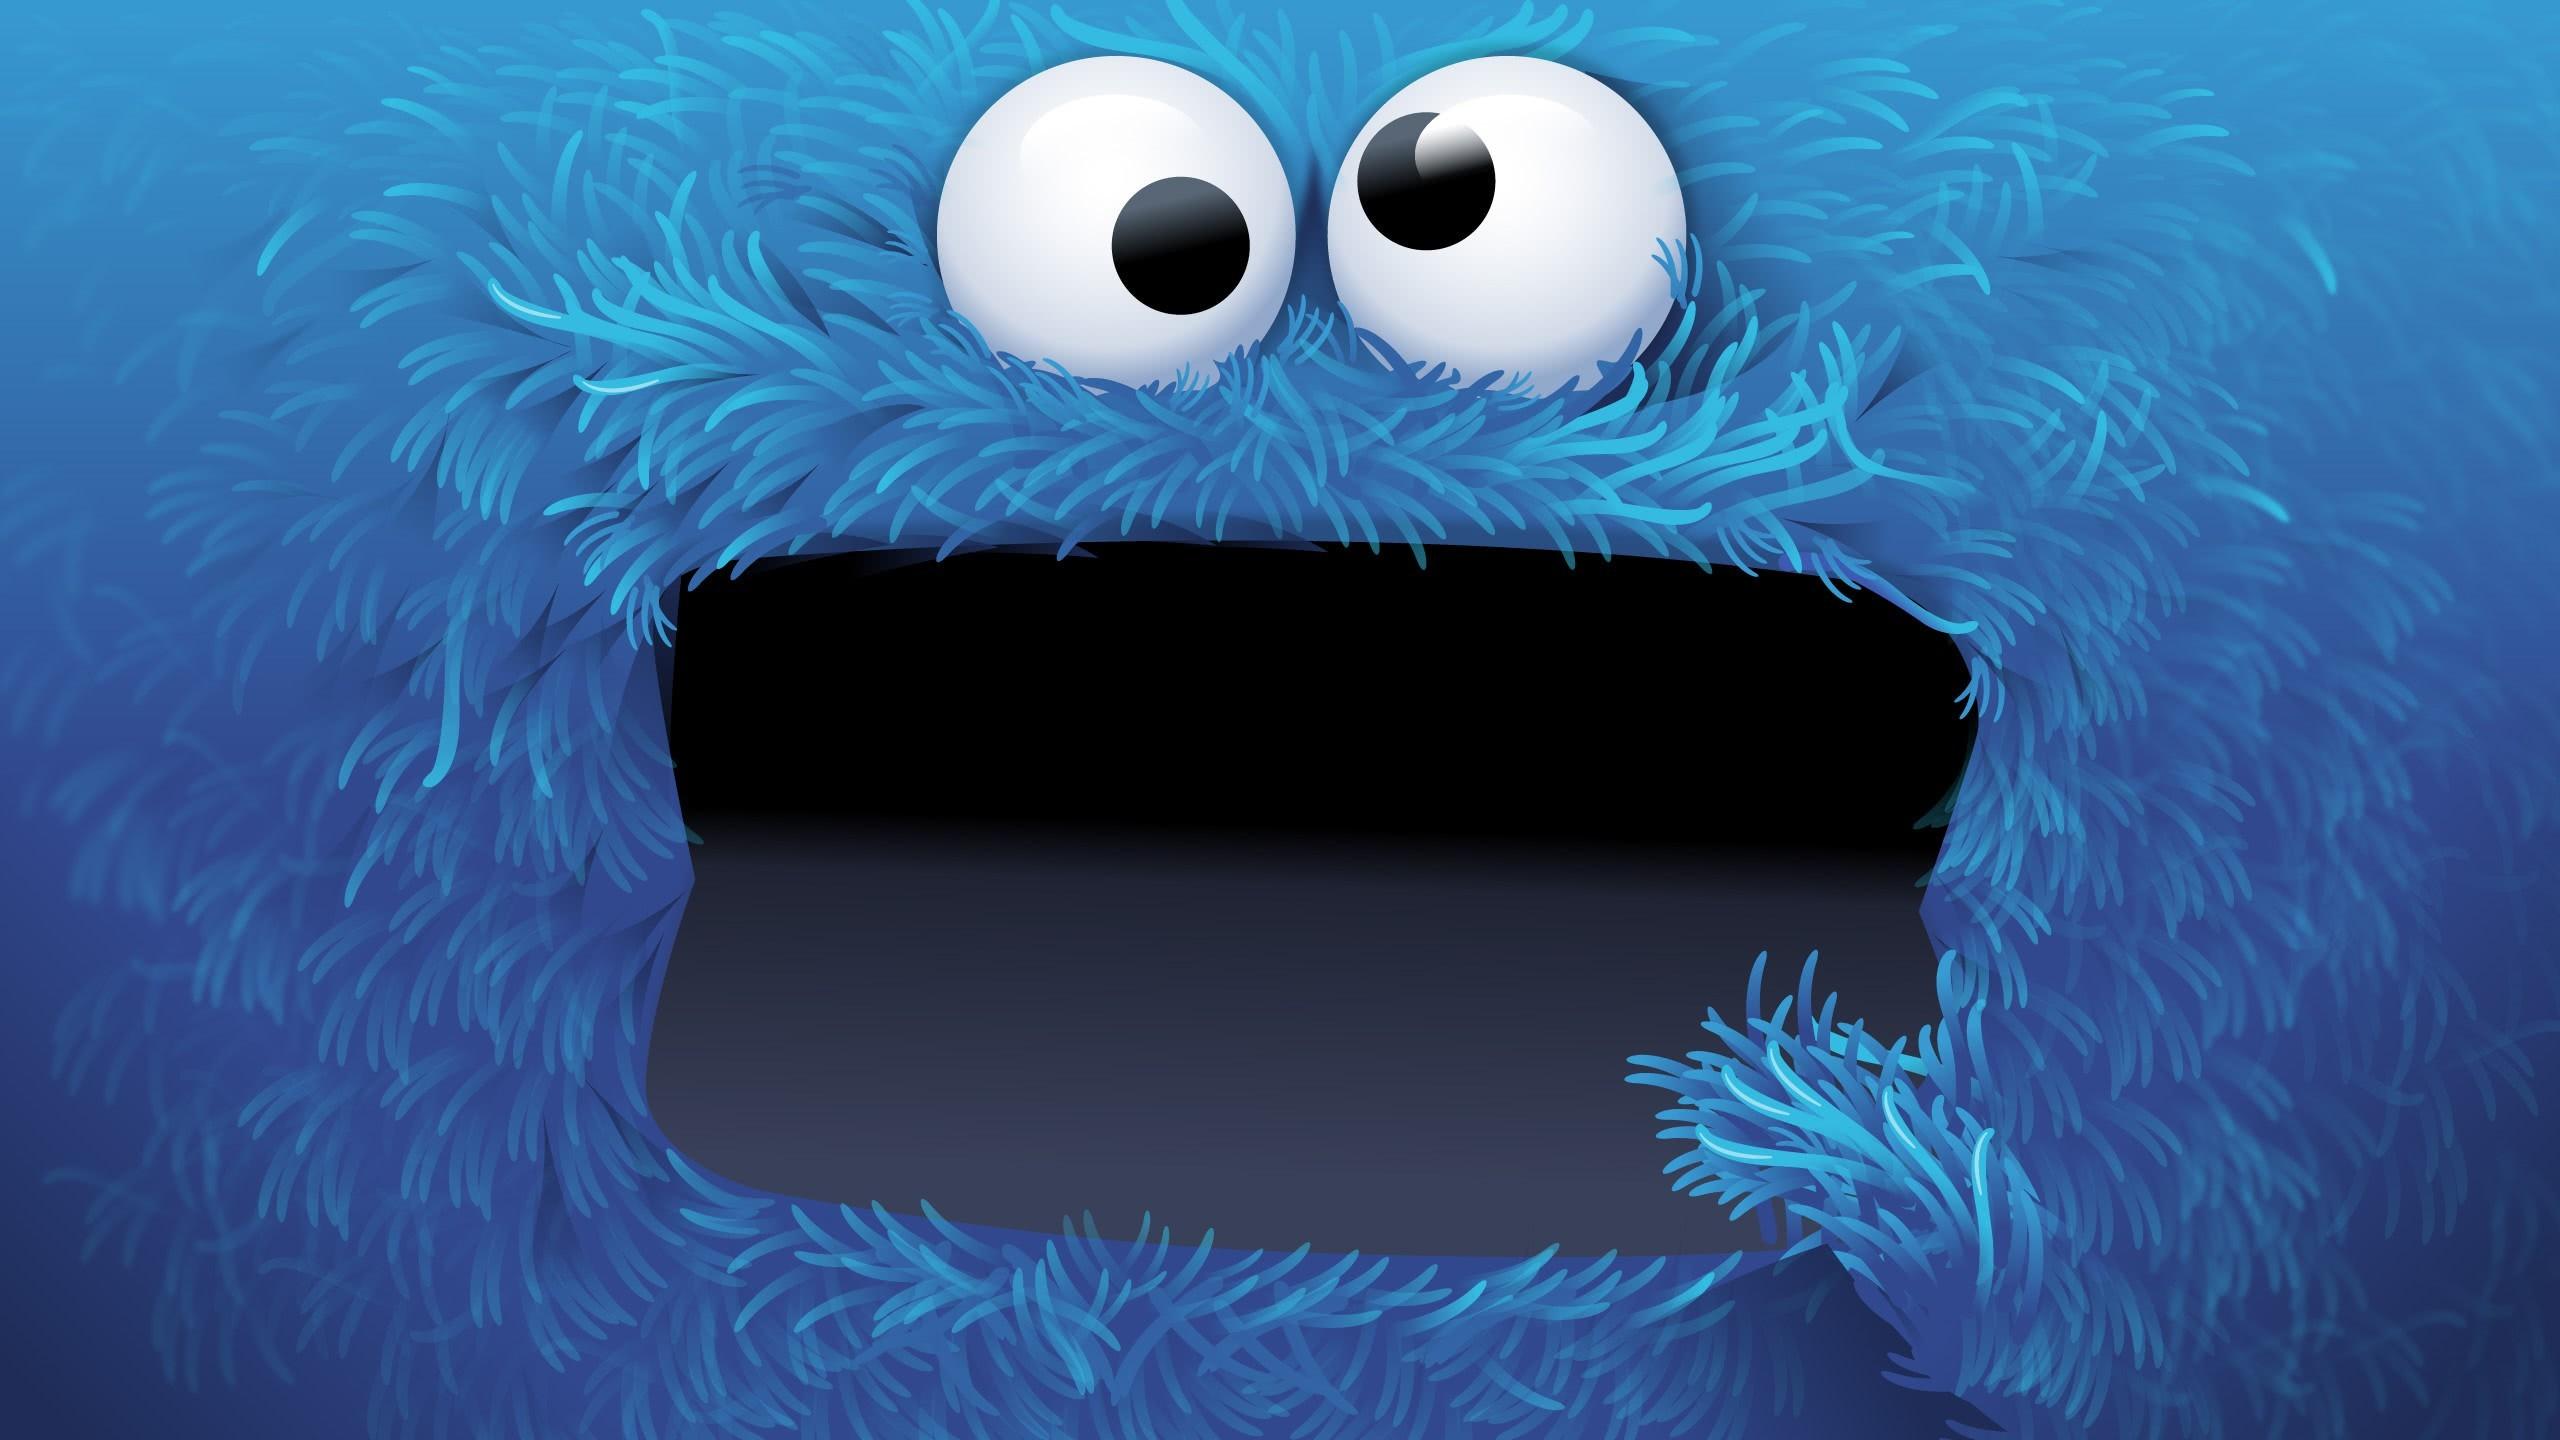 Res: 2560x1440, sesame street cookie monster wqhd 1440p wallpaper